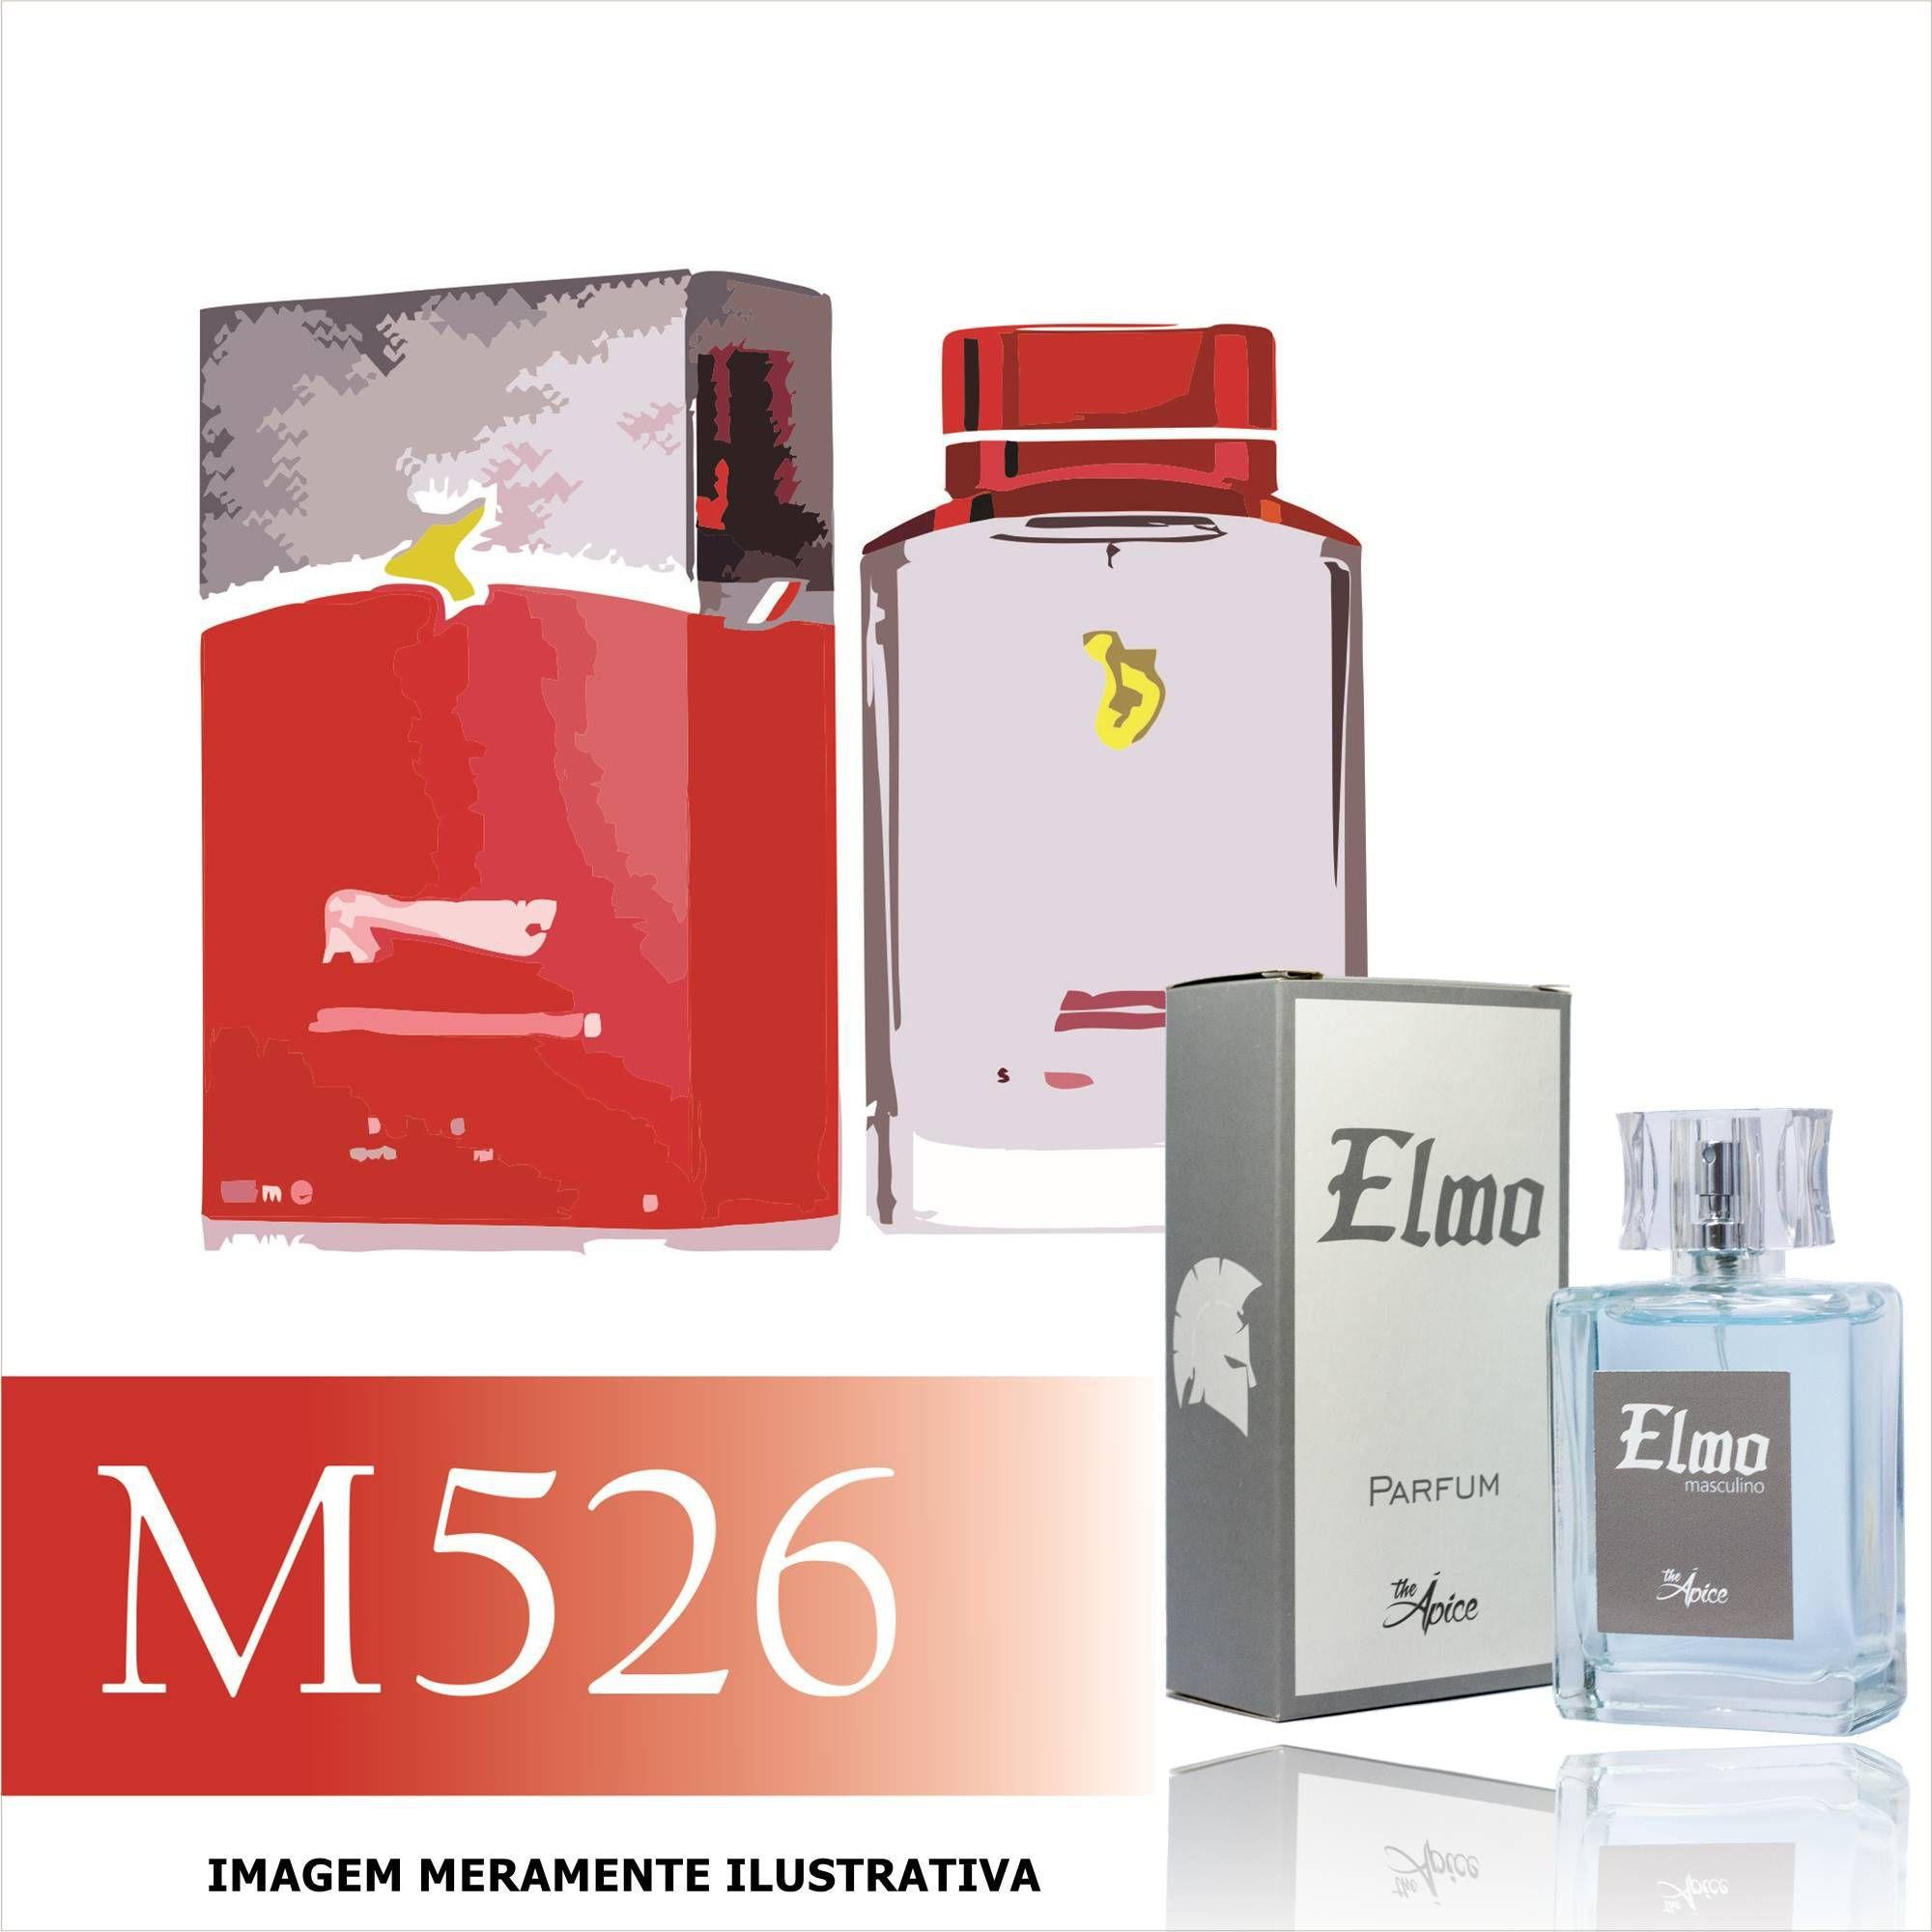 Perfume M526 Inspirado no Ferrari Scuderia Club da Ferrari Masculino